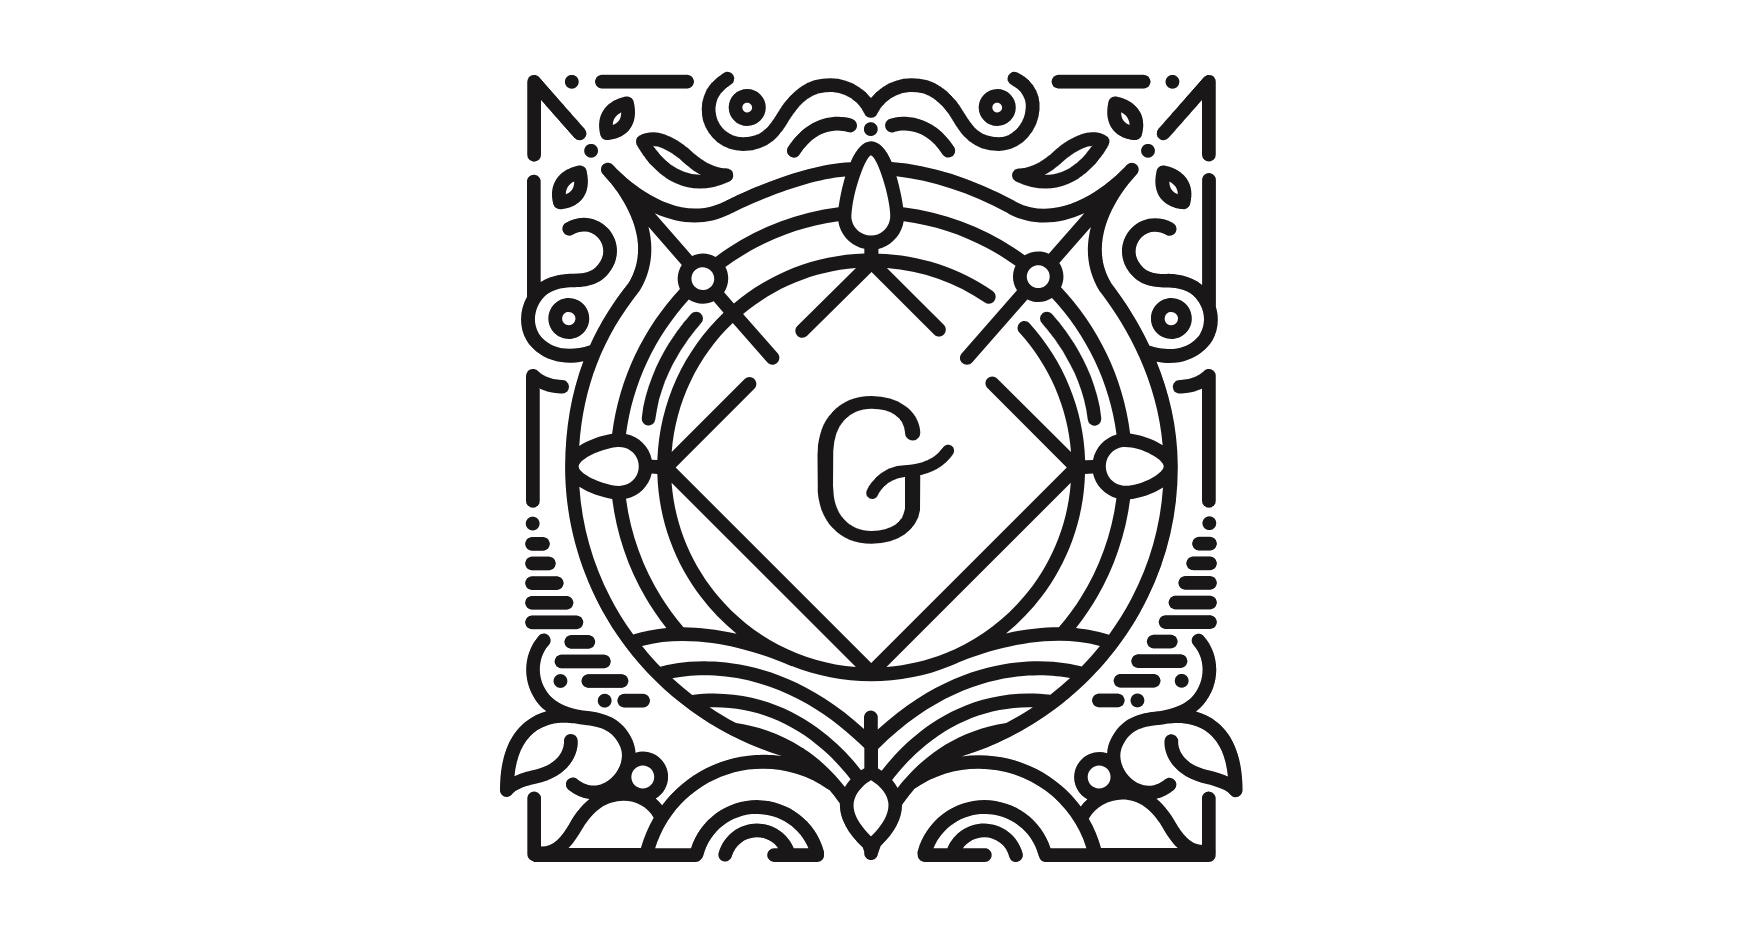 wptavern.com - Sarah Gooding - WordPress 5.0 Release Date Update to November 27